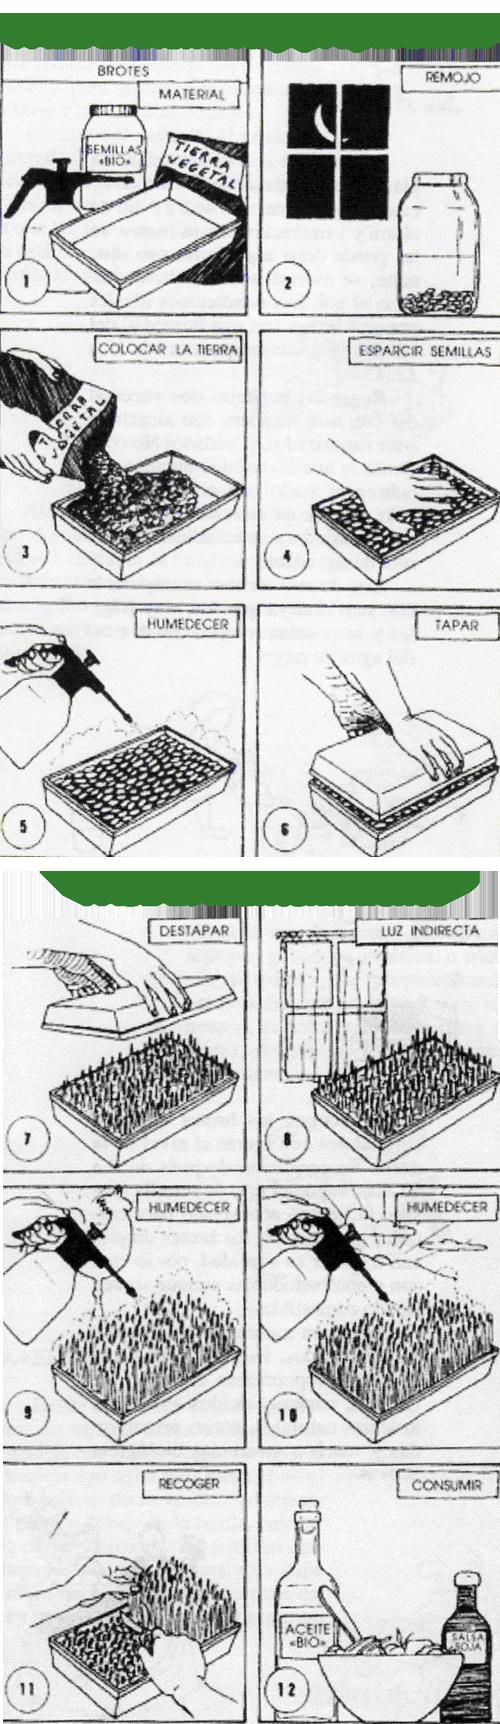 Germinados_ecologicos